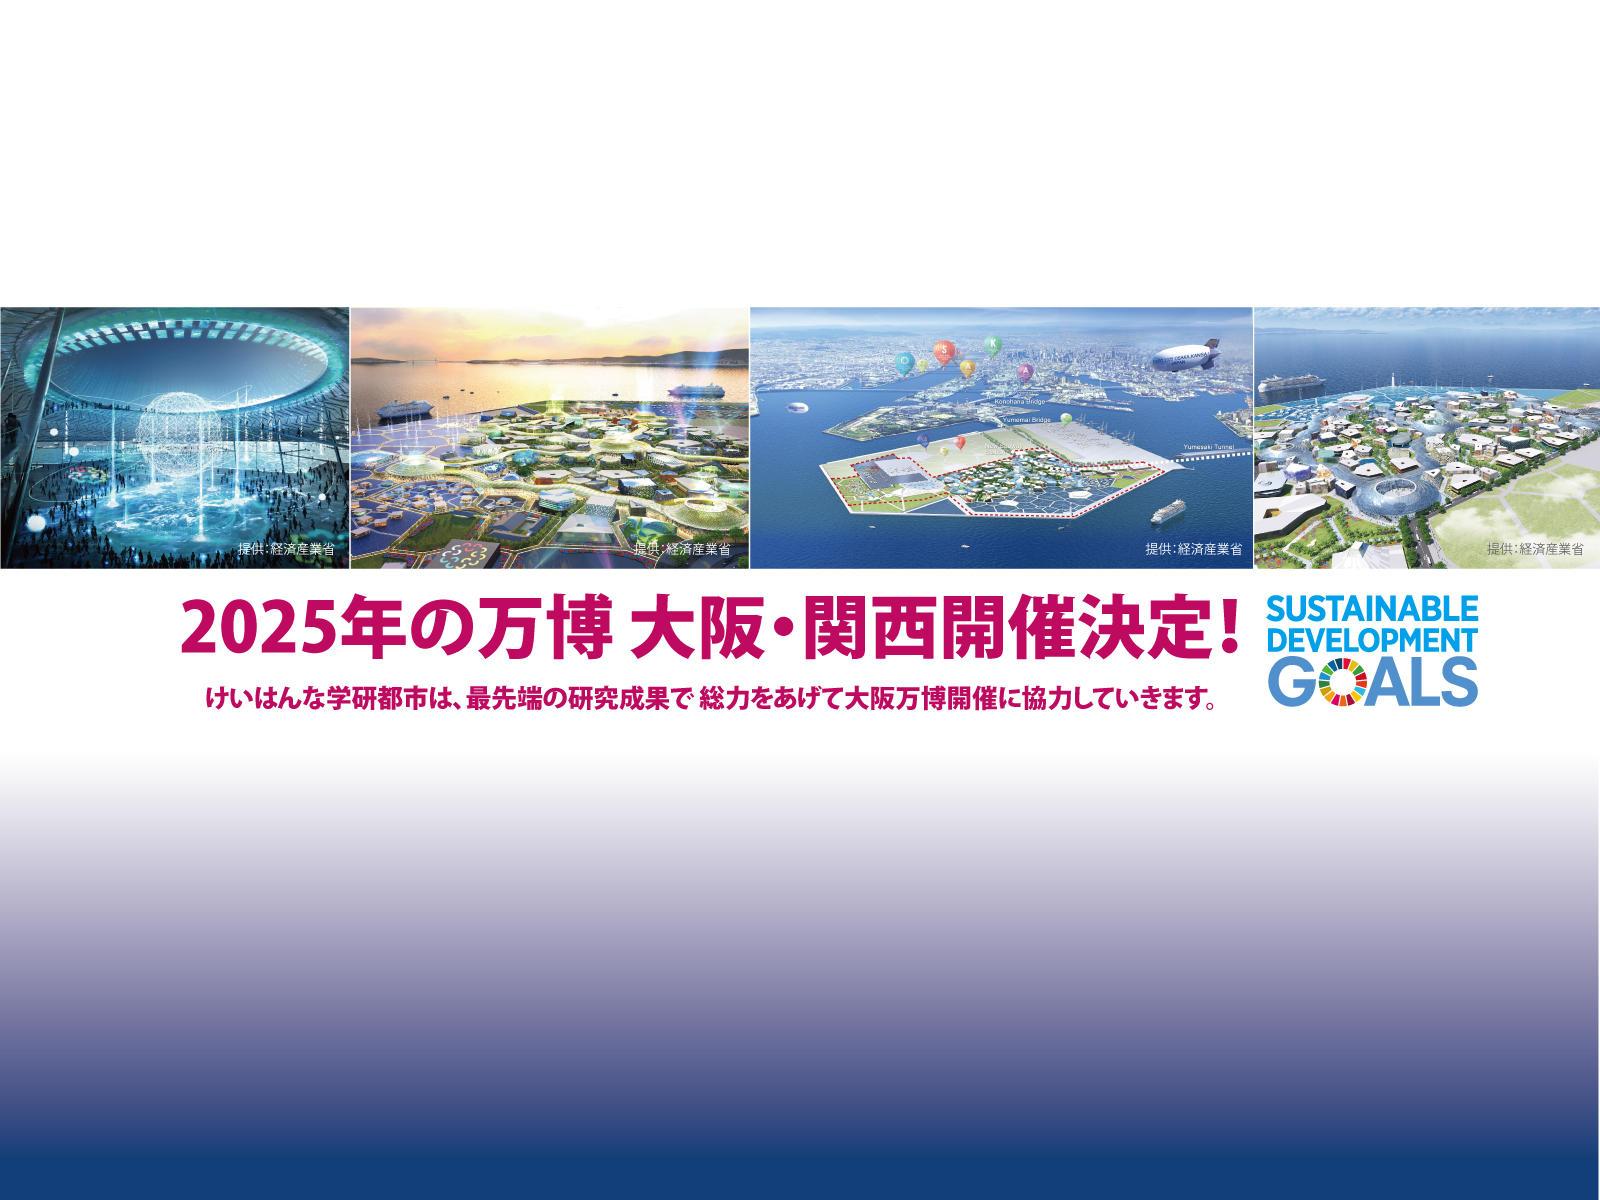 EXPO2025